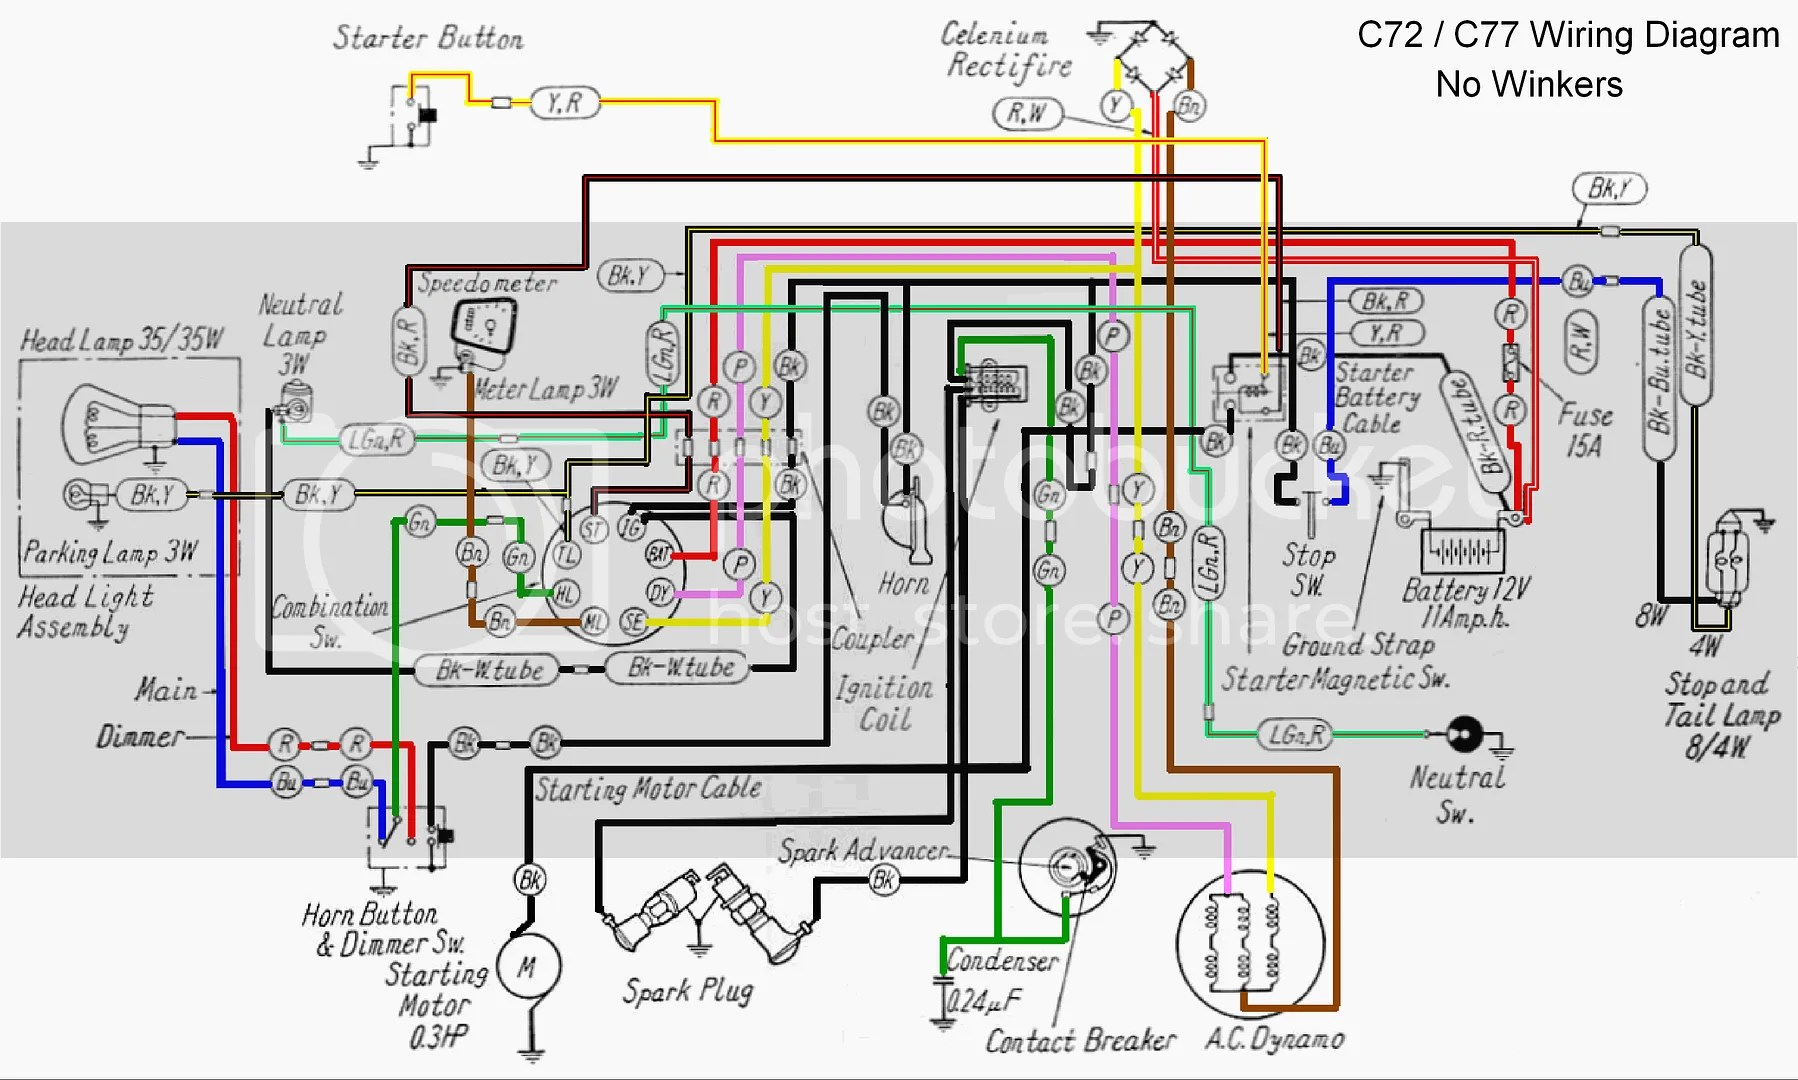 vacuum line diagram ford truck club forum caroldoey wiring diagram dat how to wire dayton barrel [ 1798 x 1080 Pixel ]